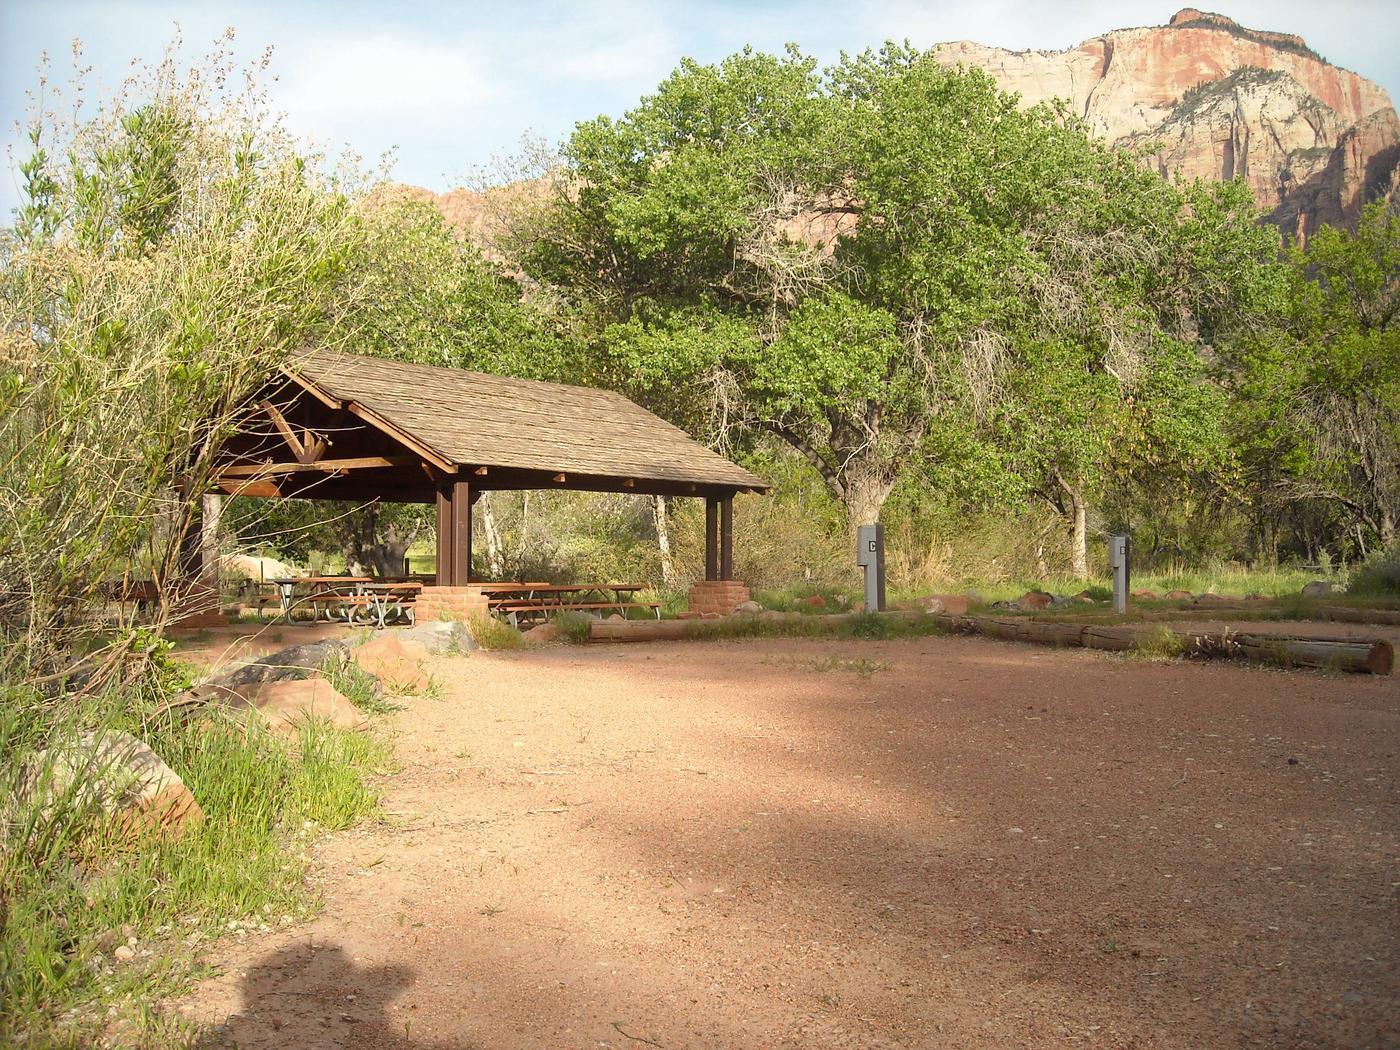 Campsite area 2B18c